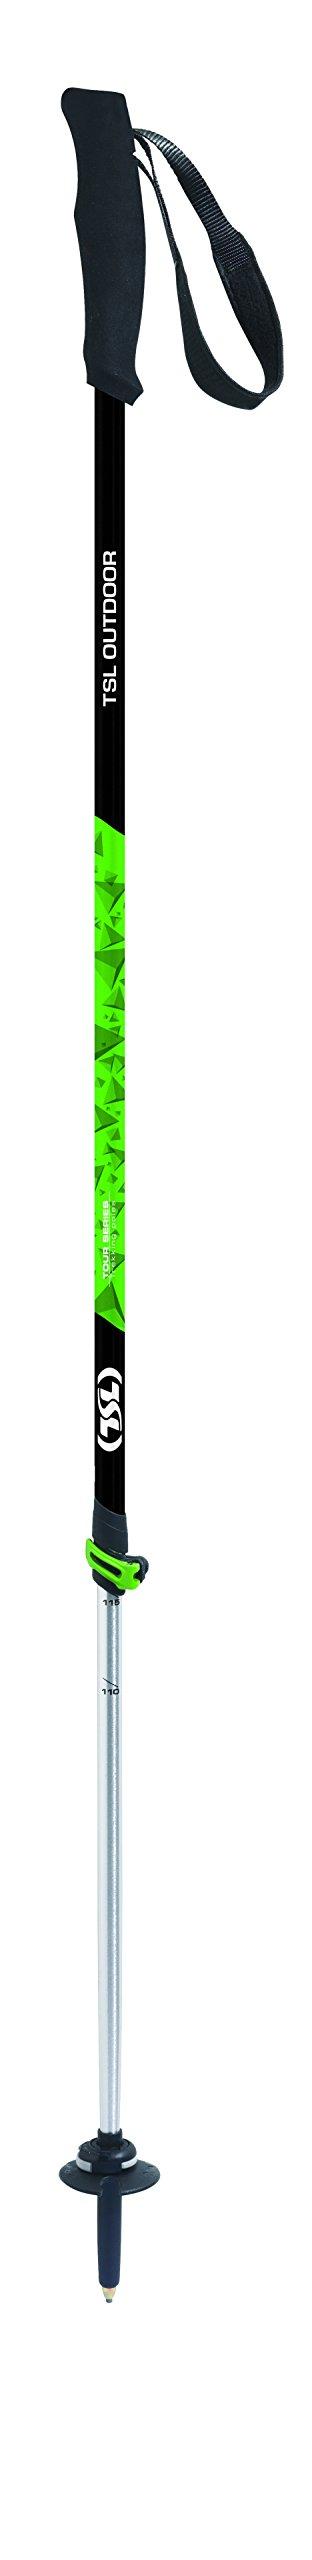 TSL Snowshoes Tour 2 Part Trekking Poles, Green & Black, 34 To 55'' by TSL Snowshoes